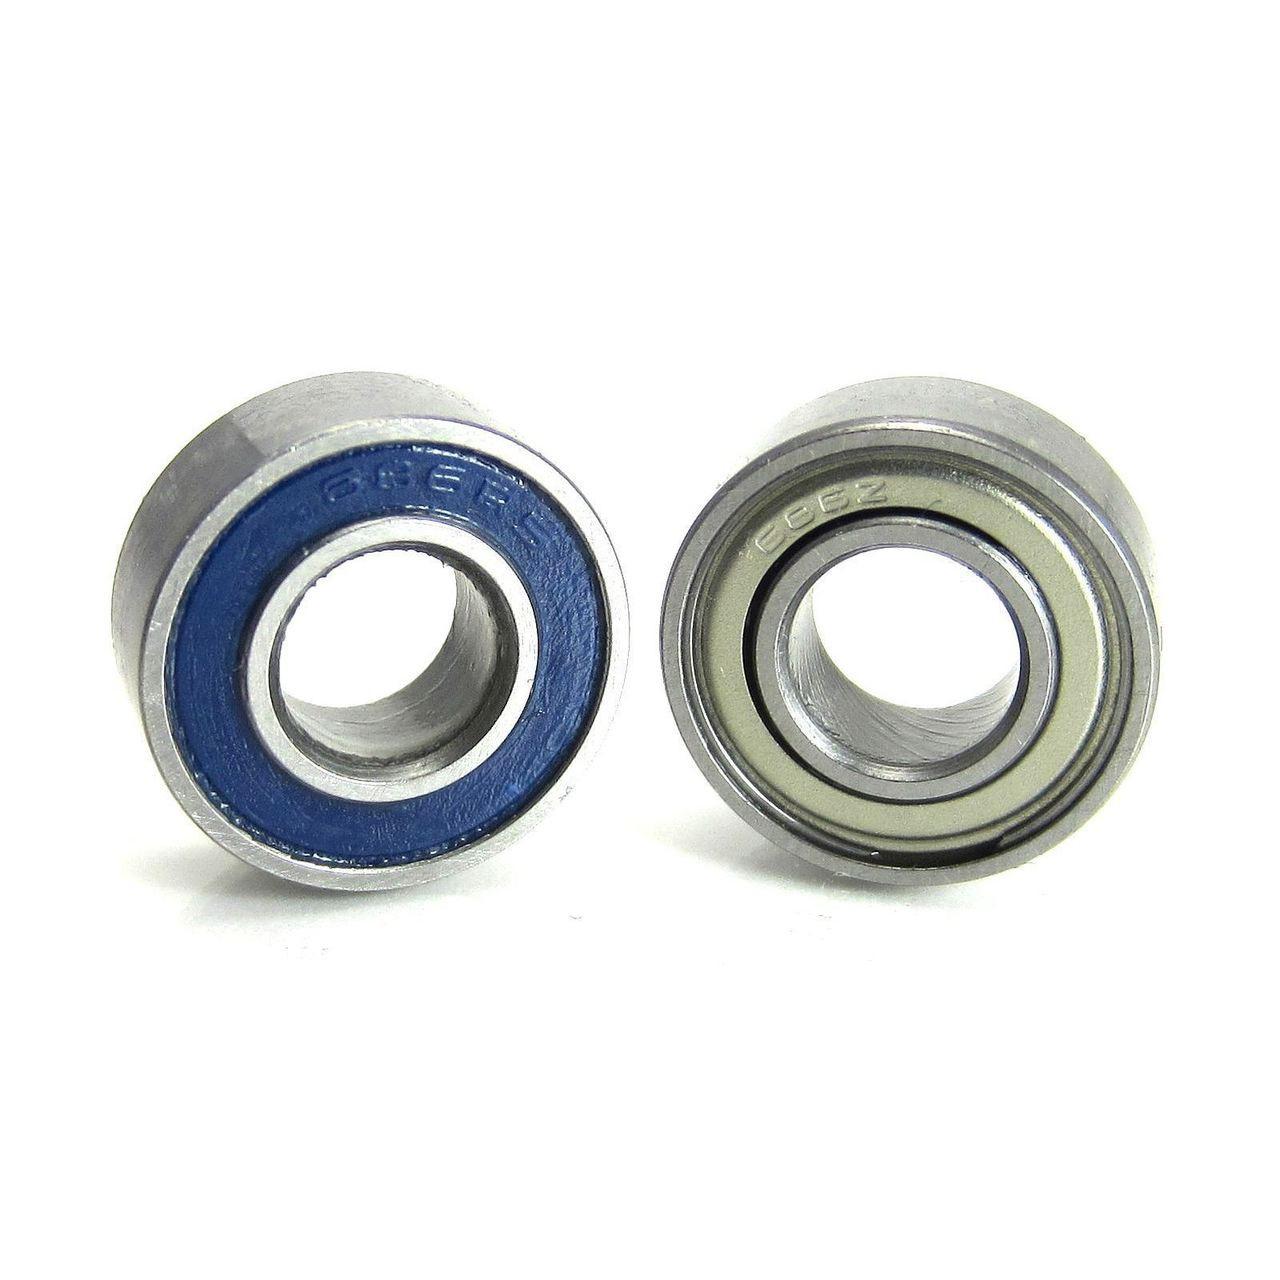 TRB RC 6x13x5mm Precision Ball Bearings ABEC 5 Hybrid Seals BLU (2)